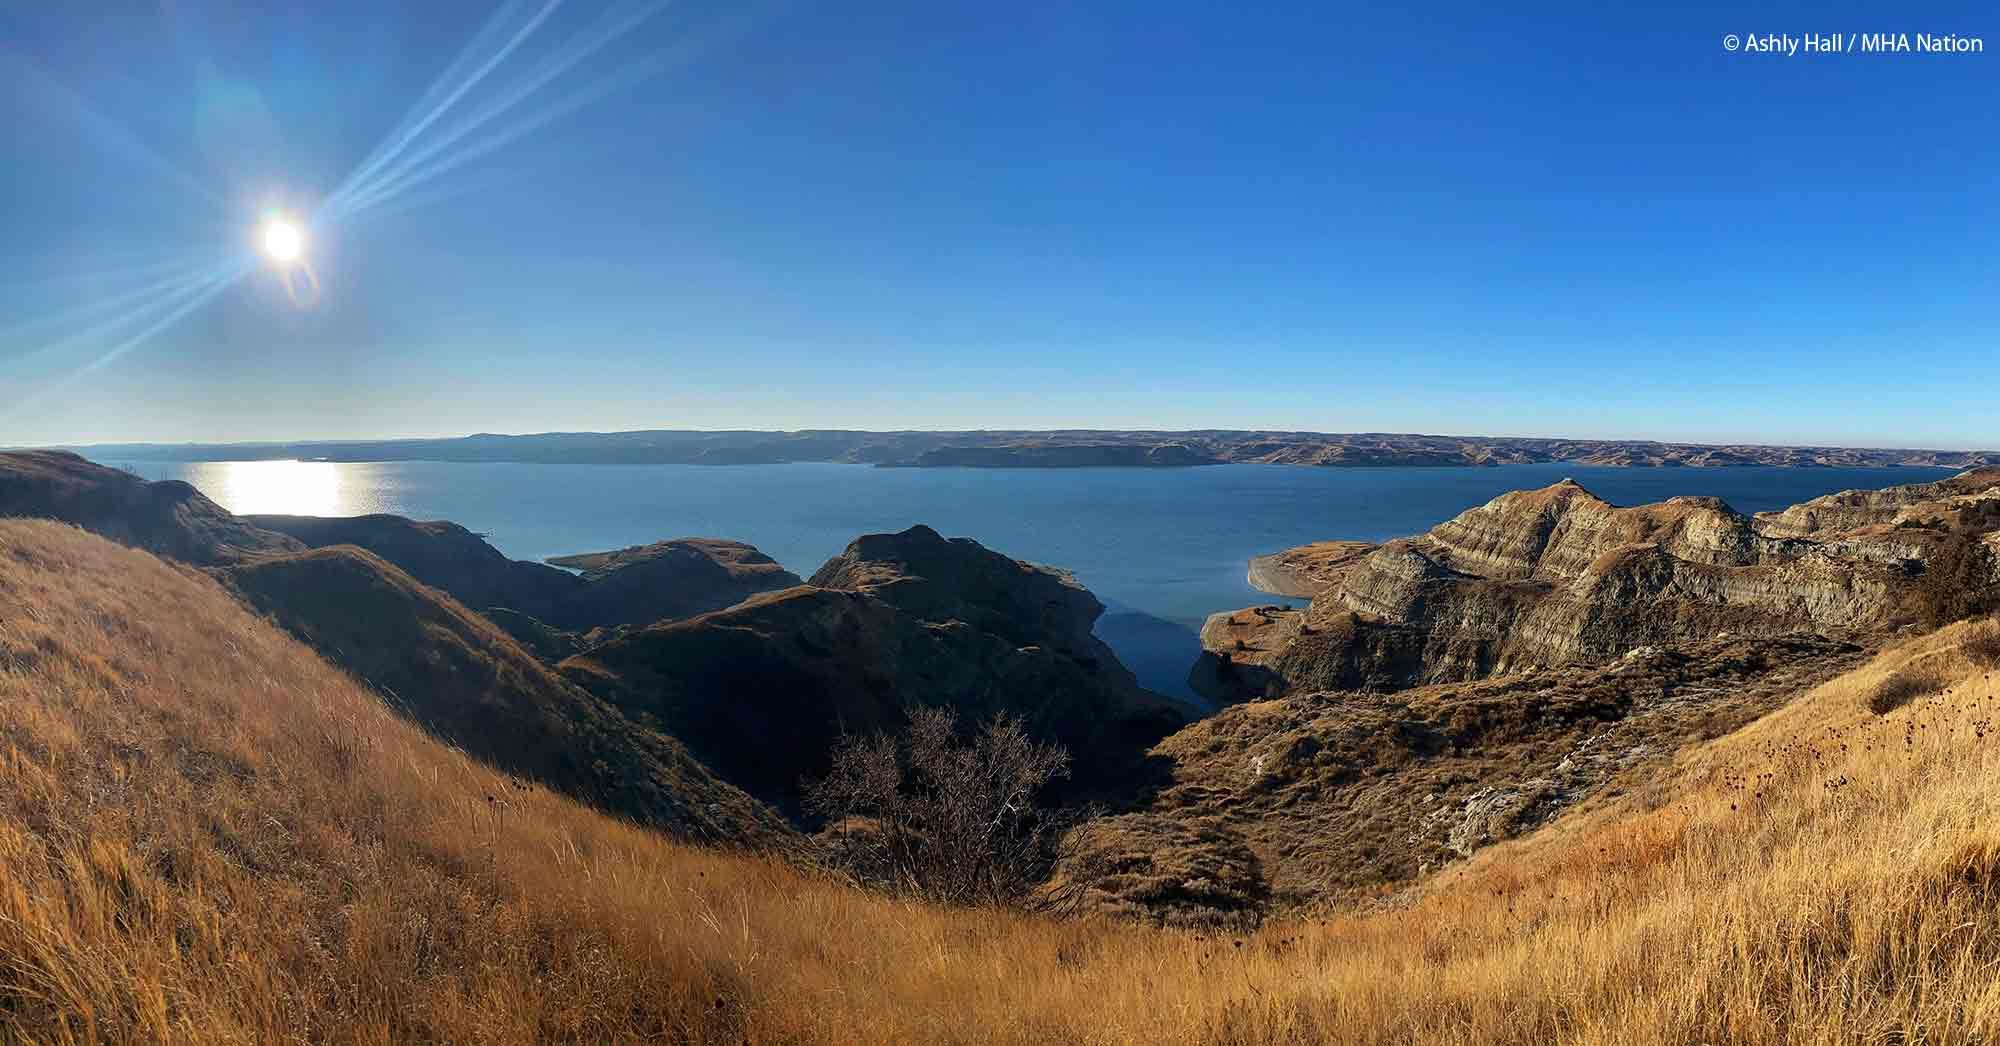 Photo courtesy of Ashley Hall, location MHA Nation, North Dakota